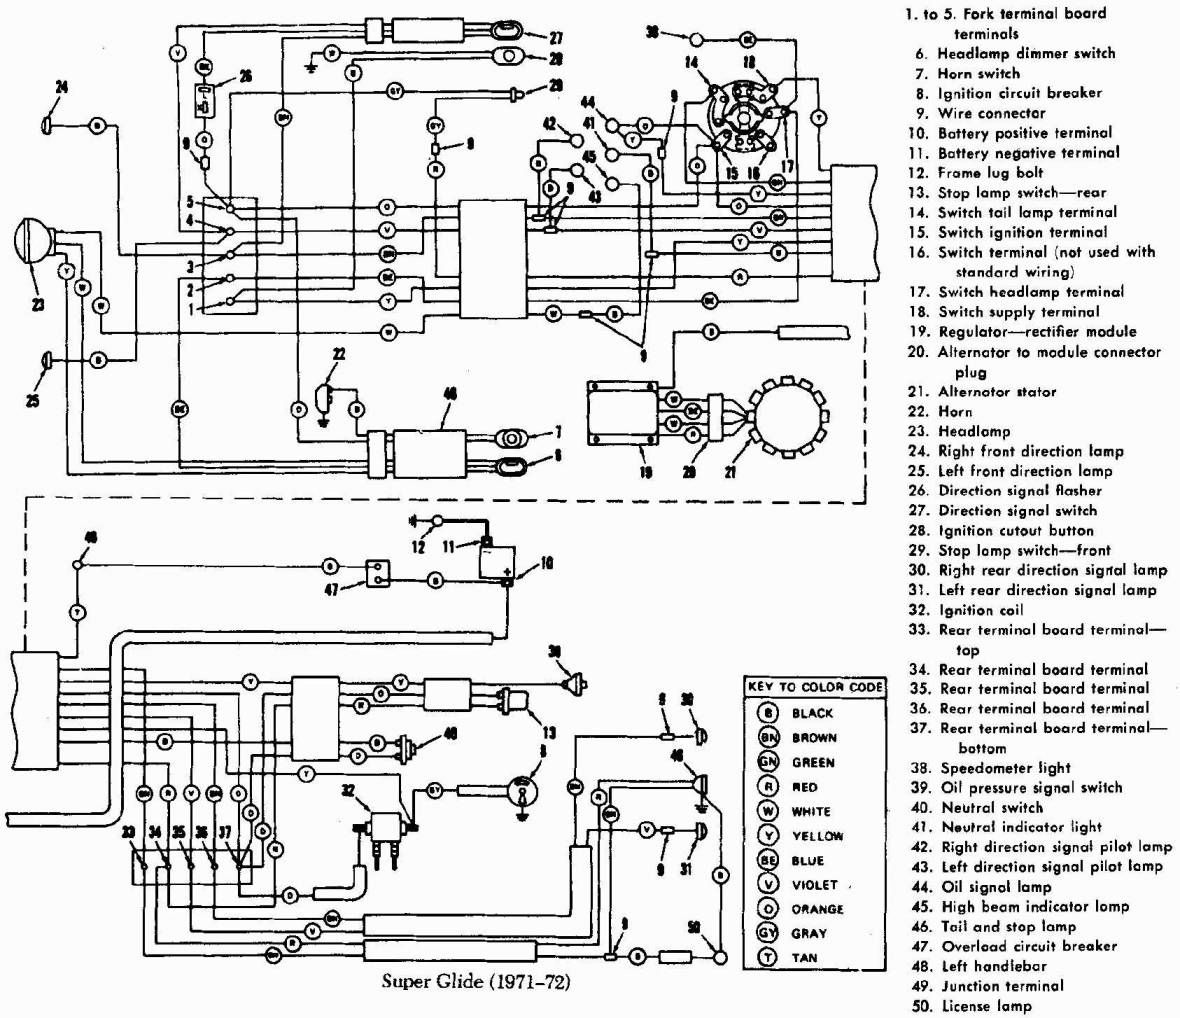 [DIAGRAM] Harley Davidson Street Glide Wiring Diagram For 2010